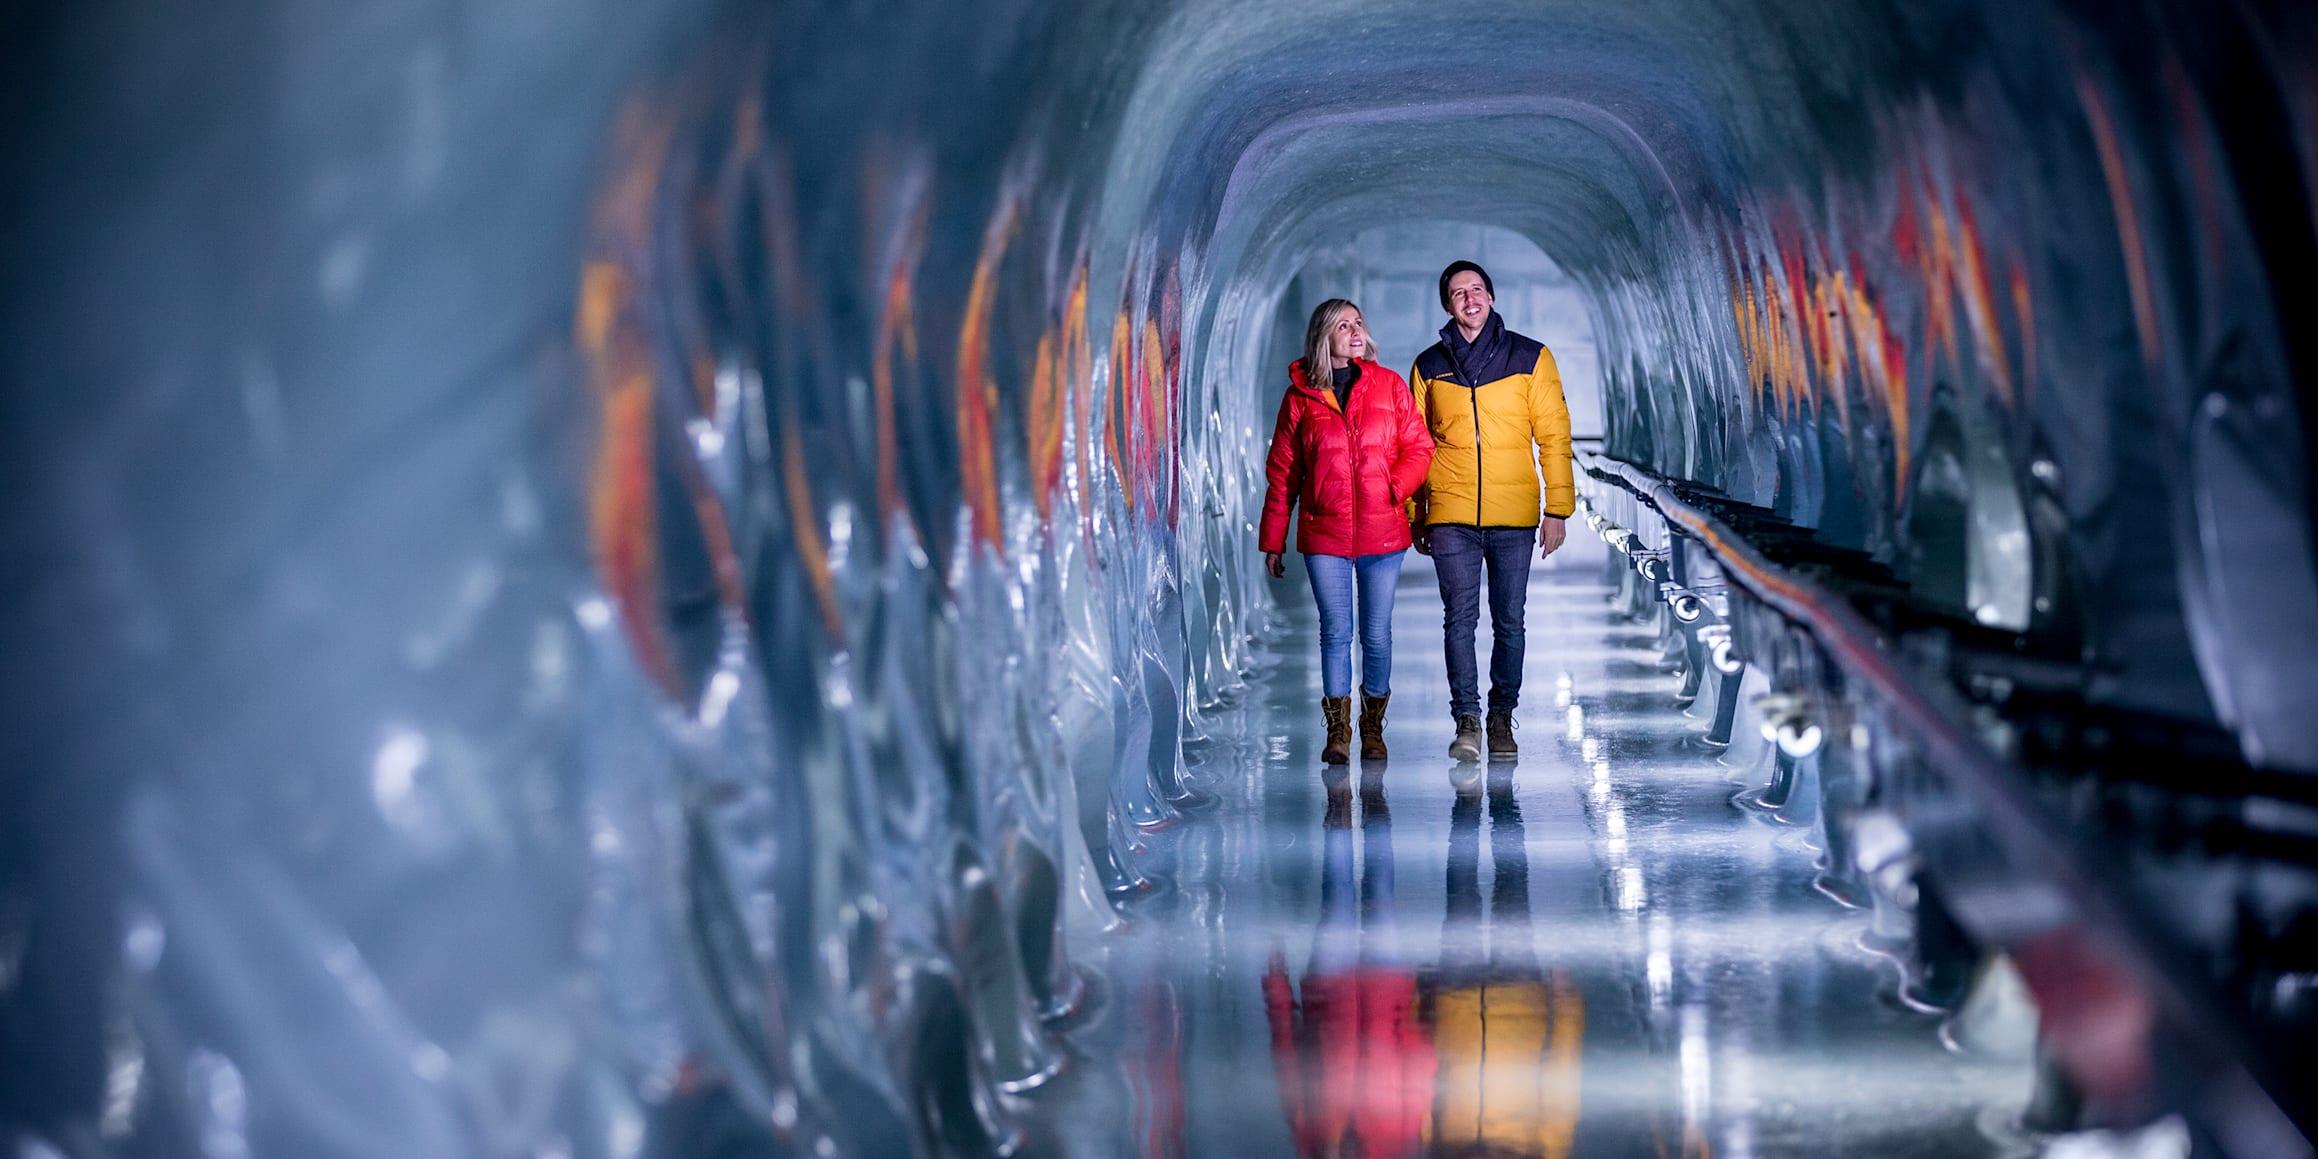 One Way Auto >> Ice Palace | jungfrau.ch